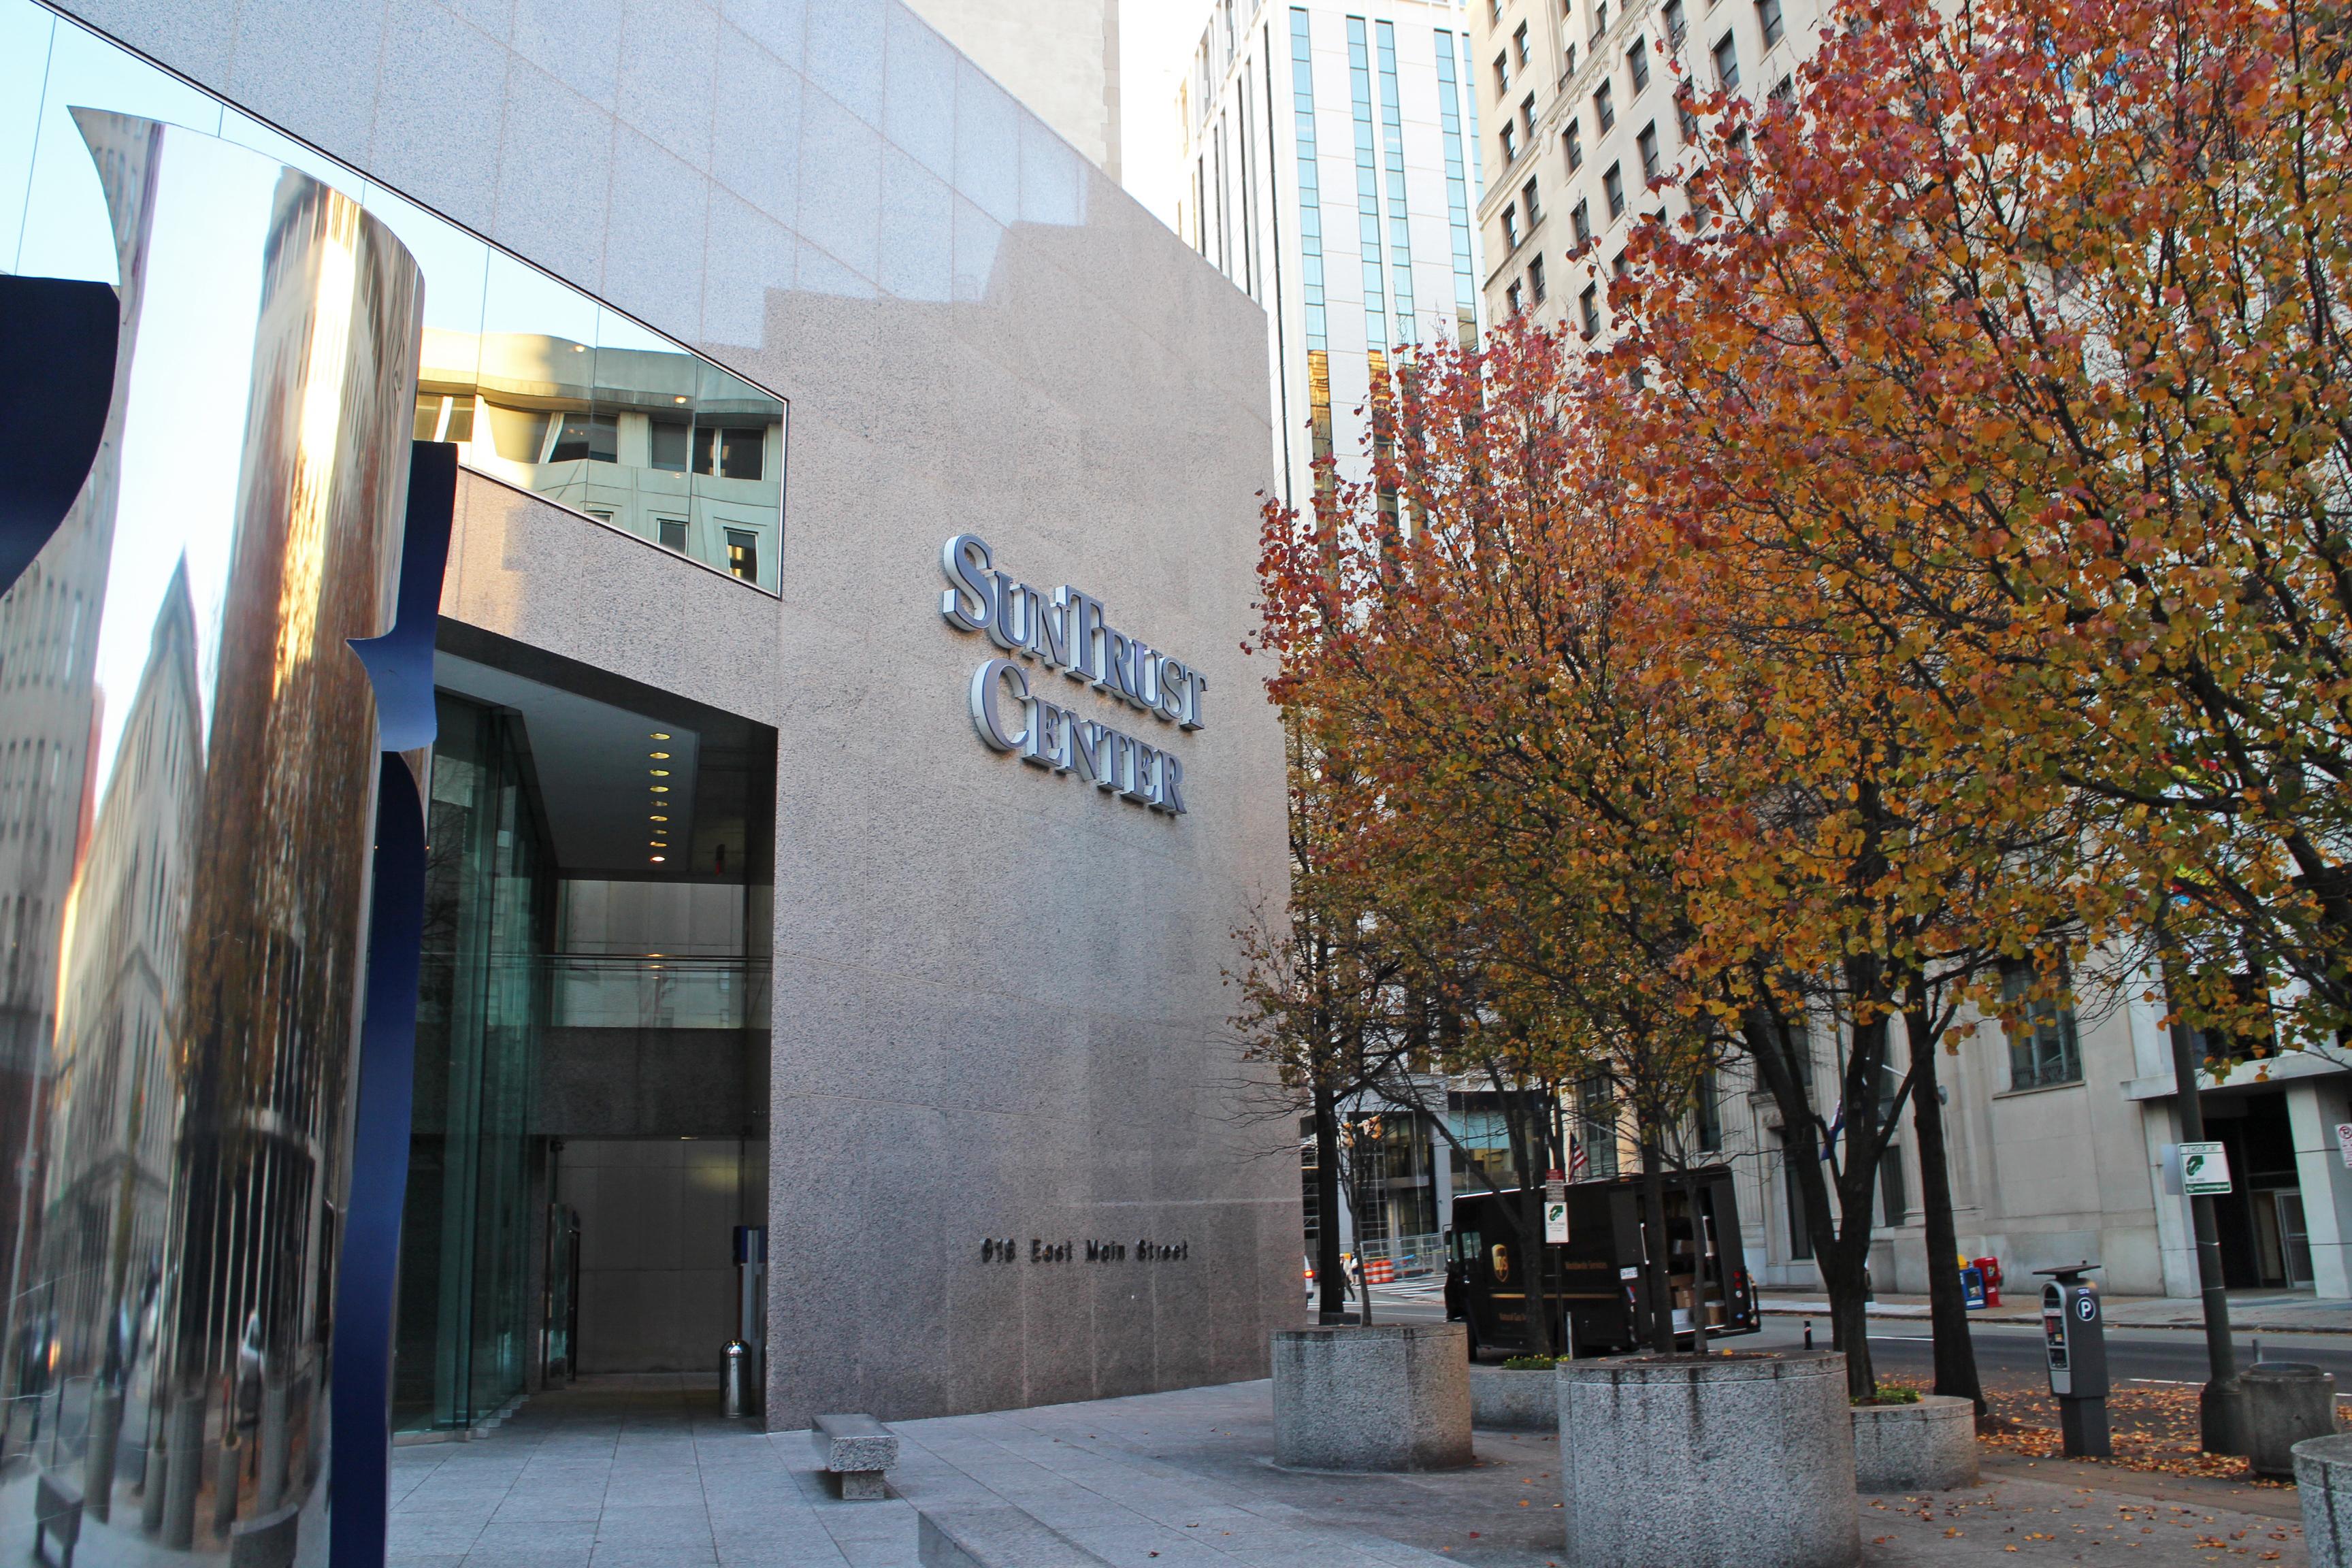 The SunTrust Center on East Main Street.